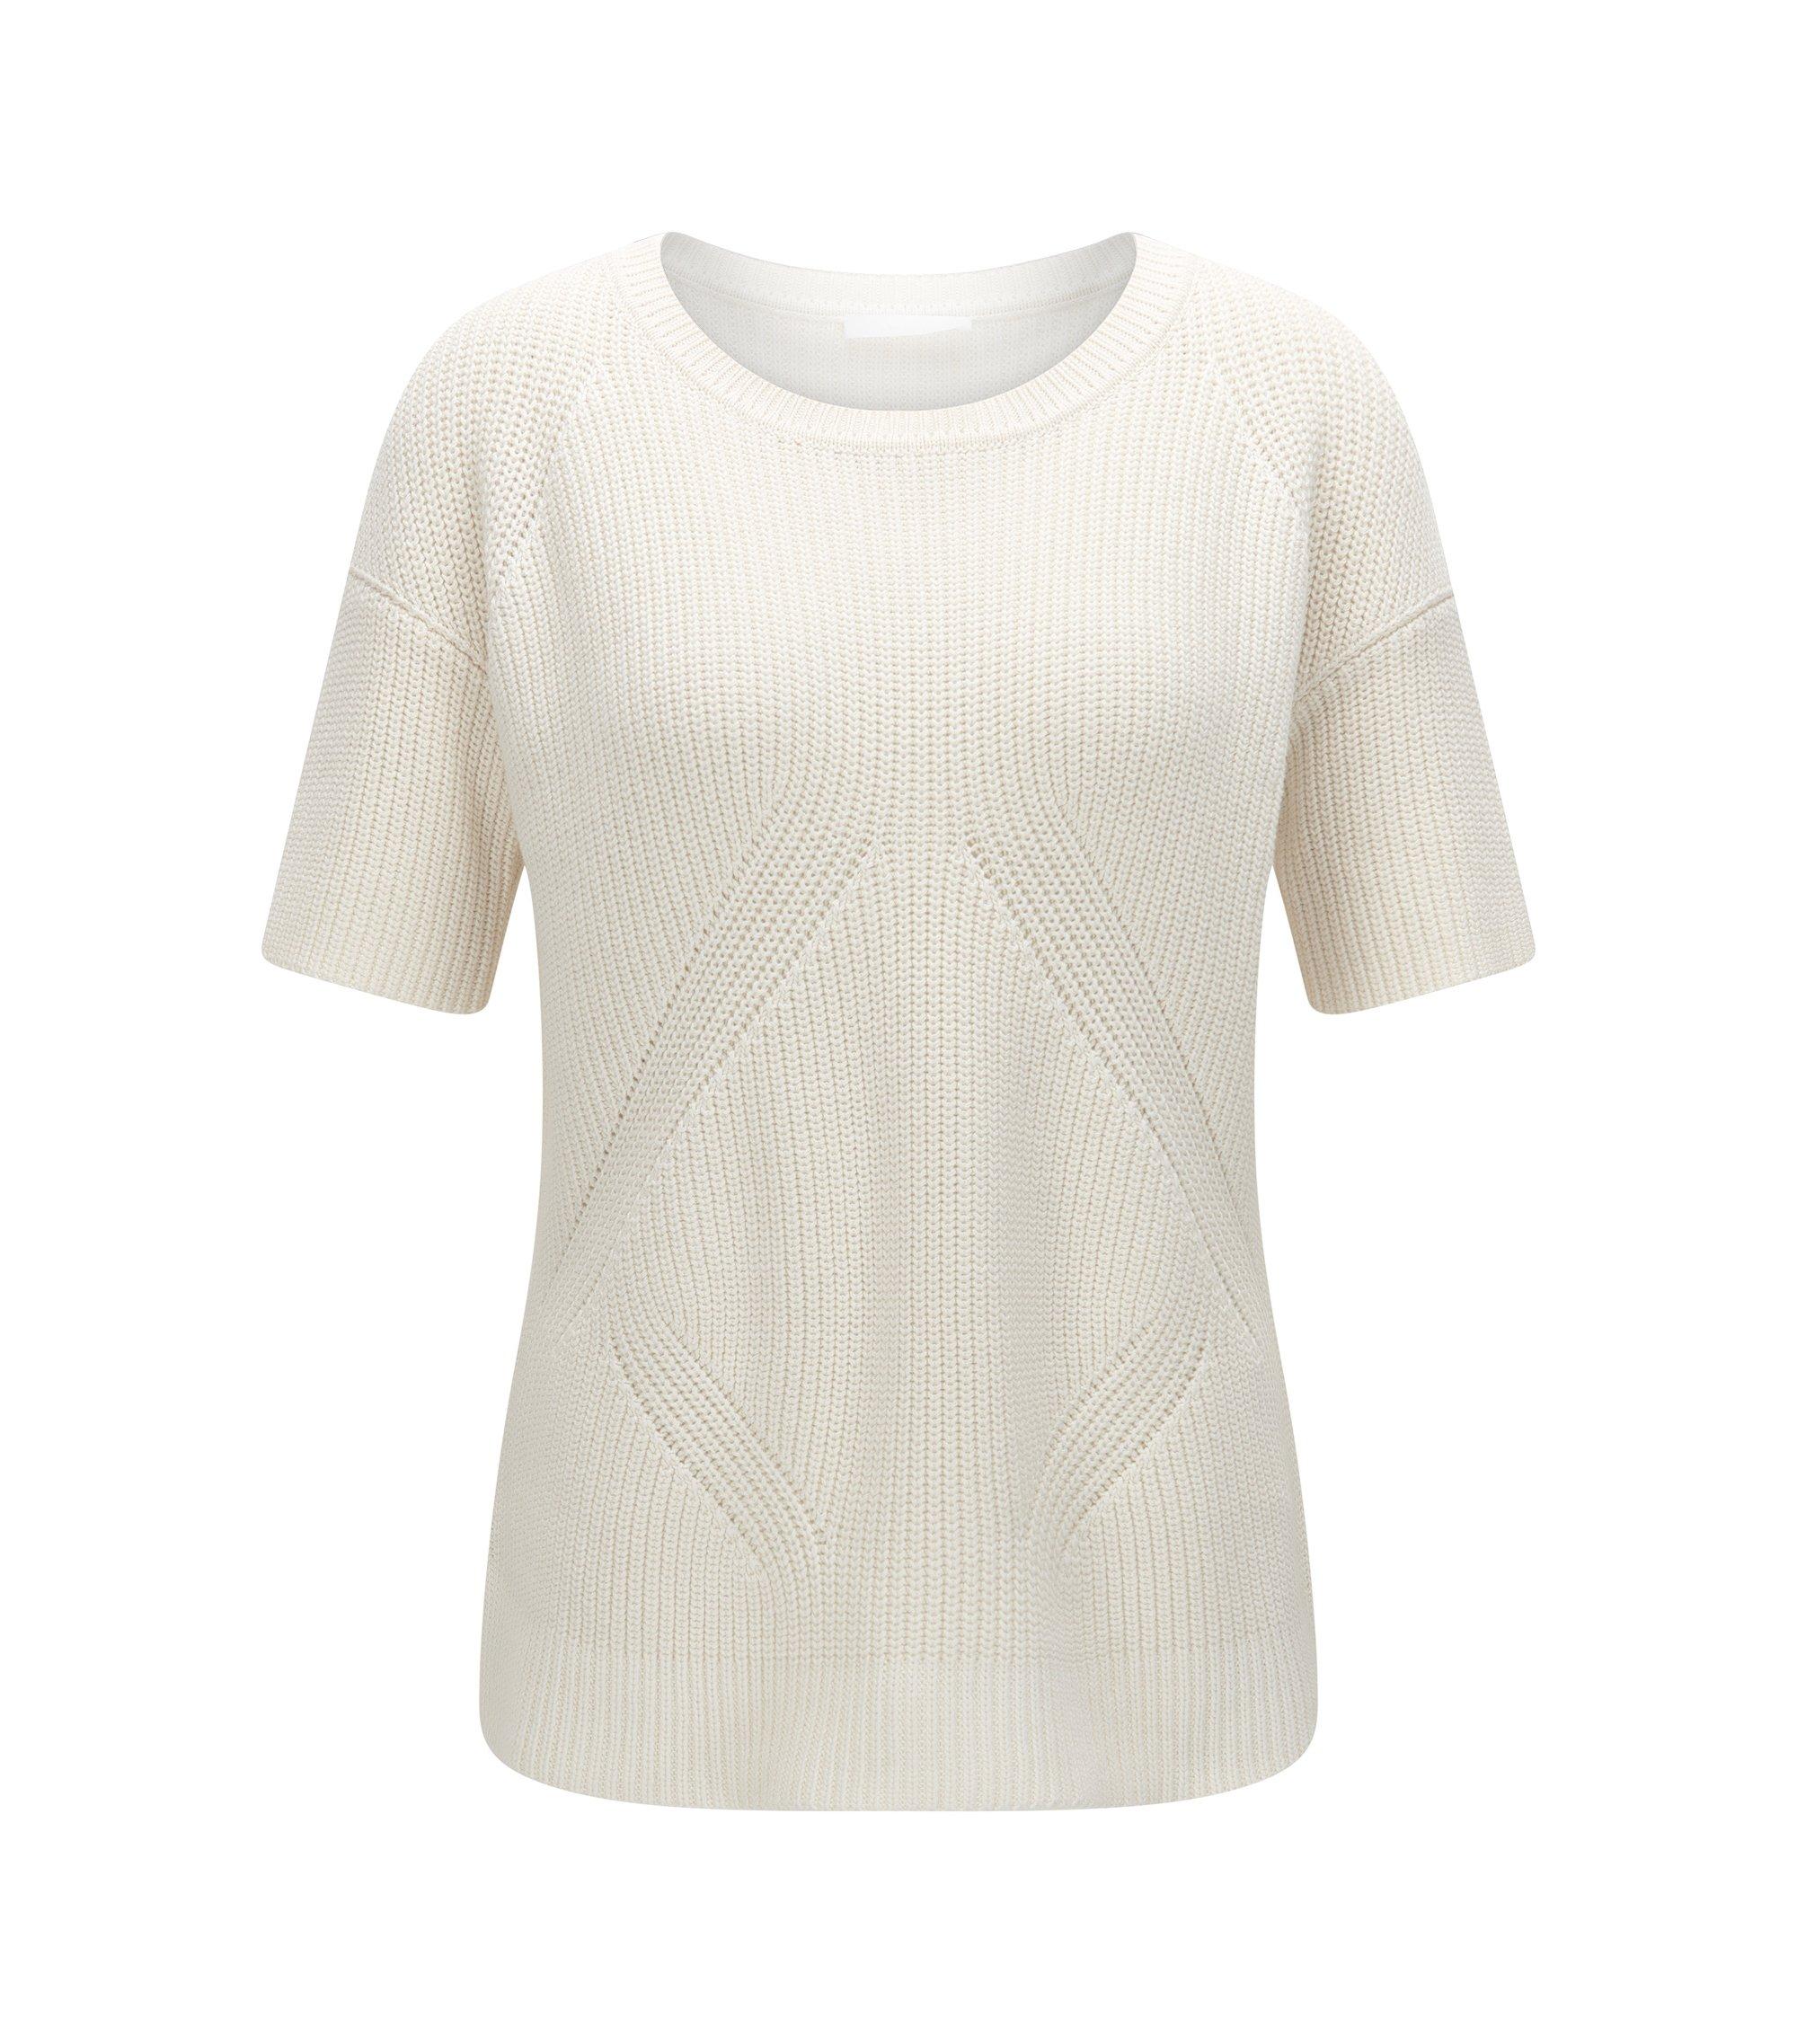 Cotton Silk Cashmere Knit Top | Fiola, Natural